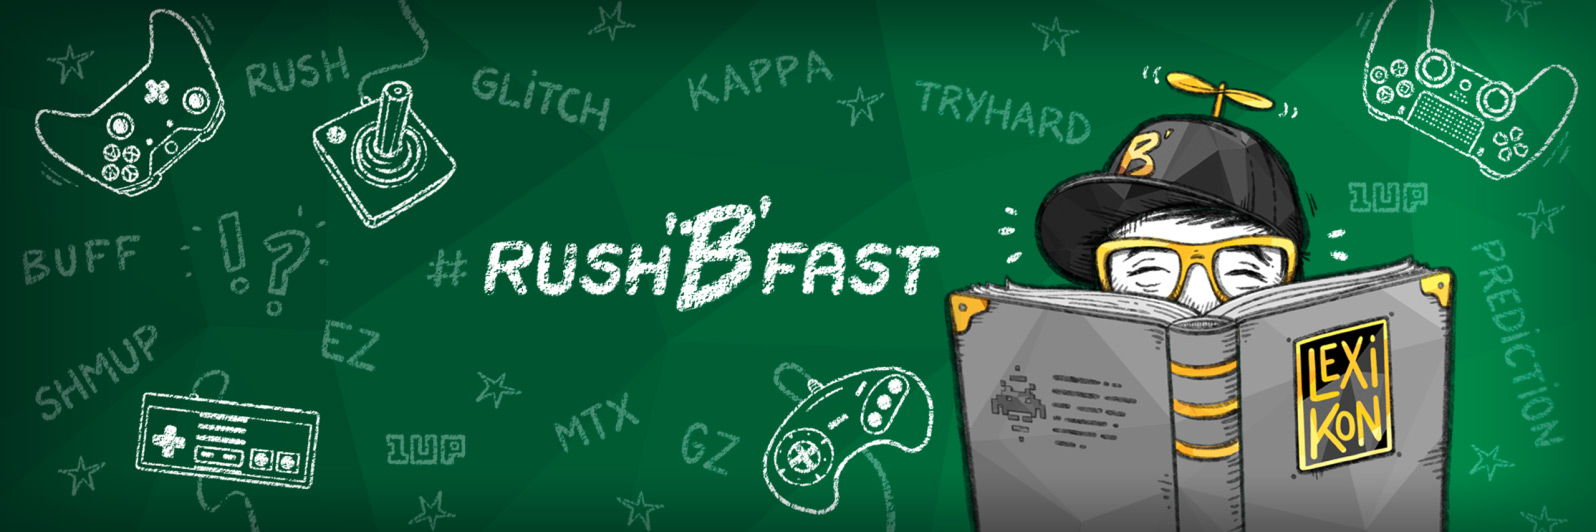 rushBfast – Nerdlexikon Artwork, Illustration: oasentier